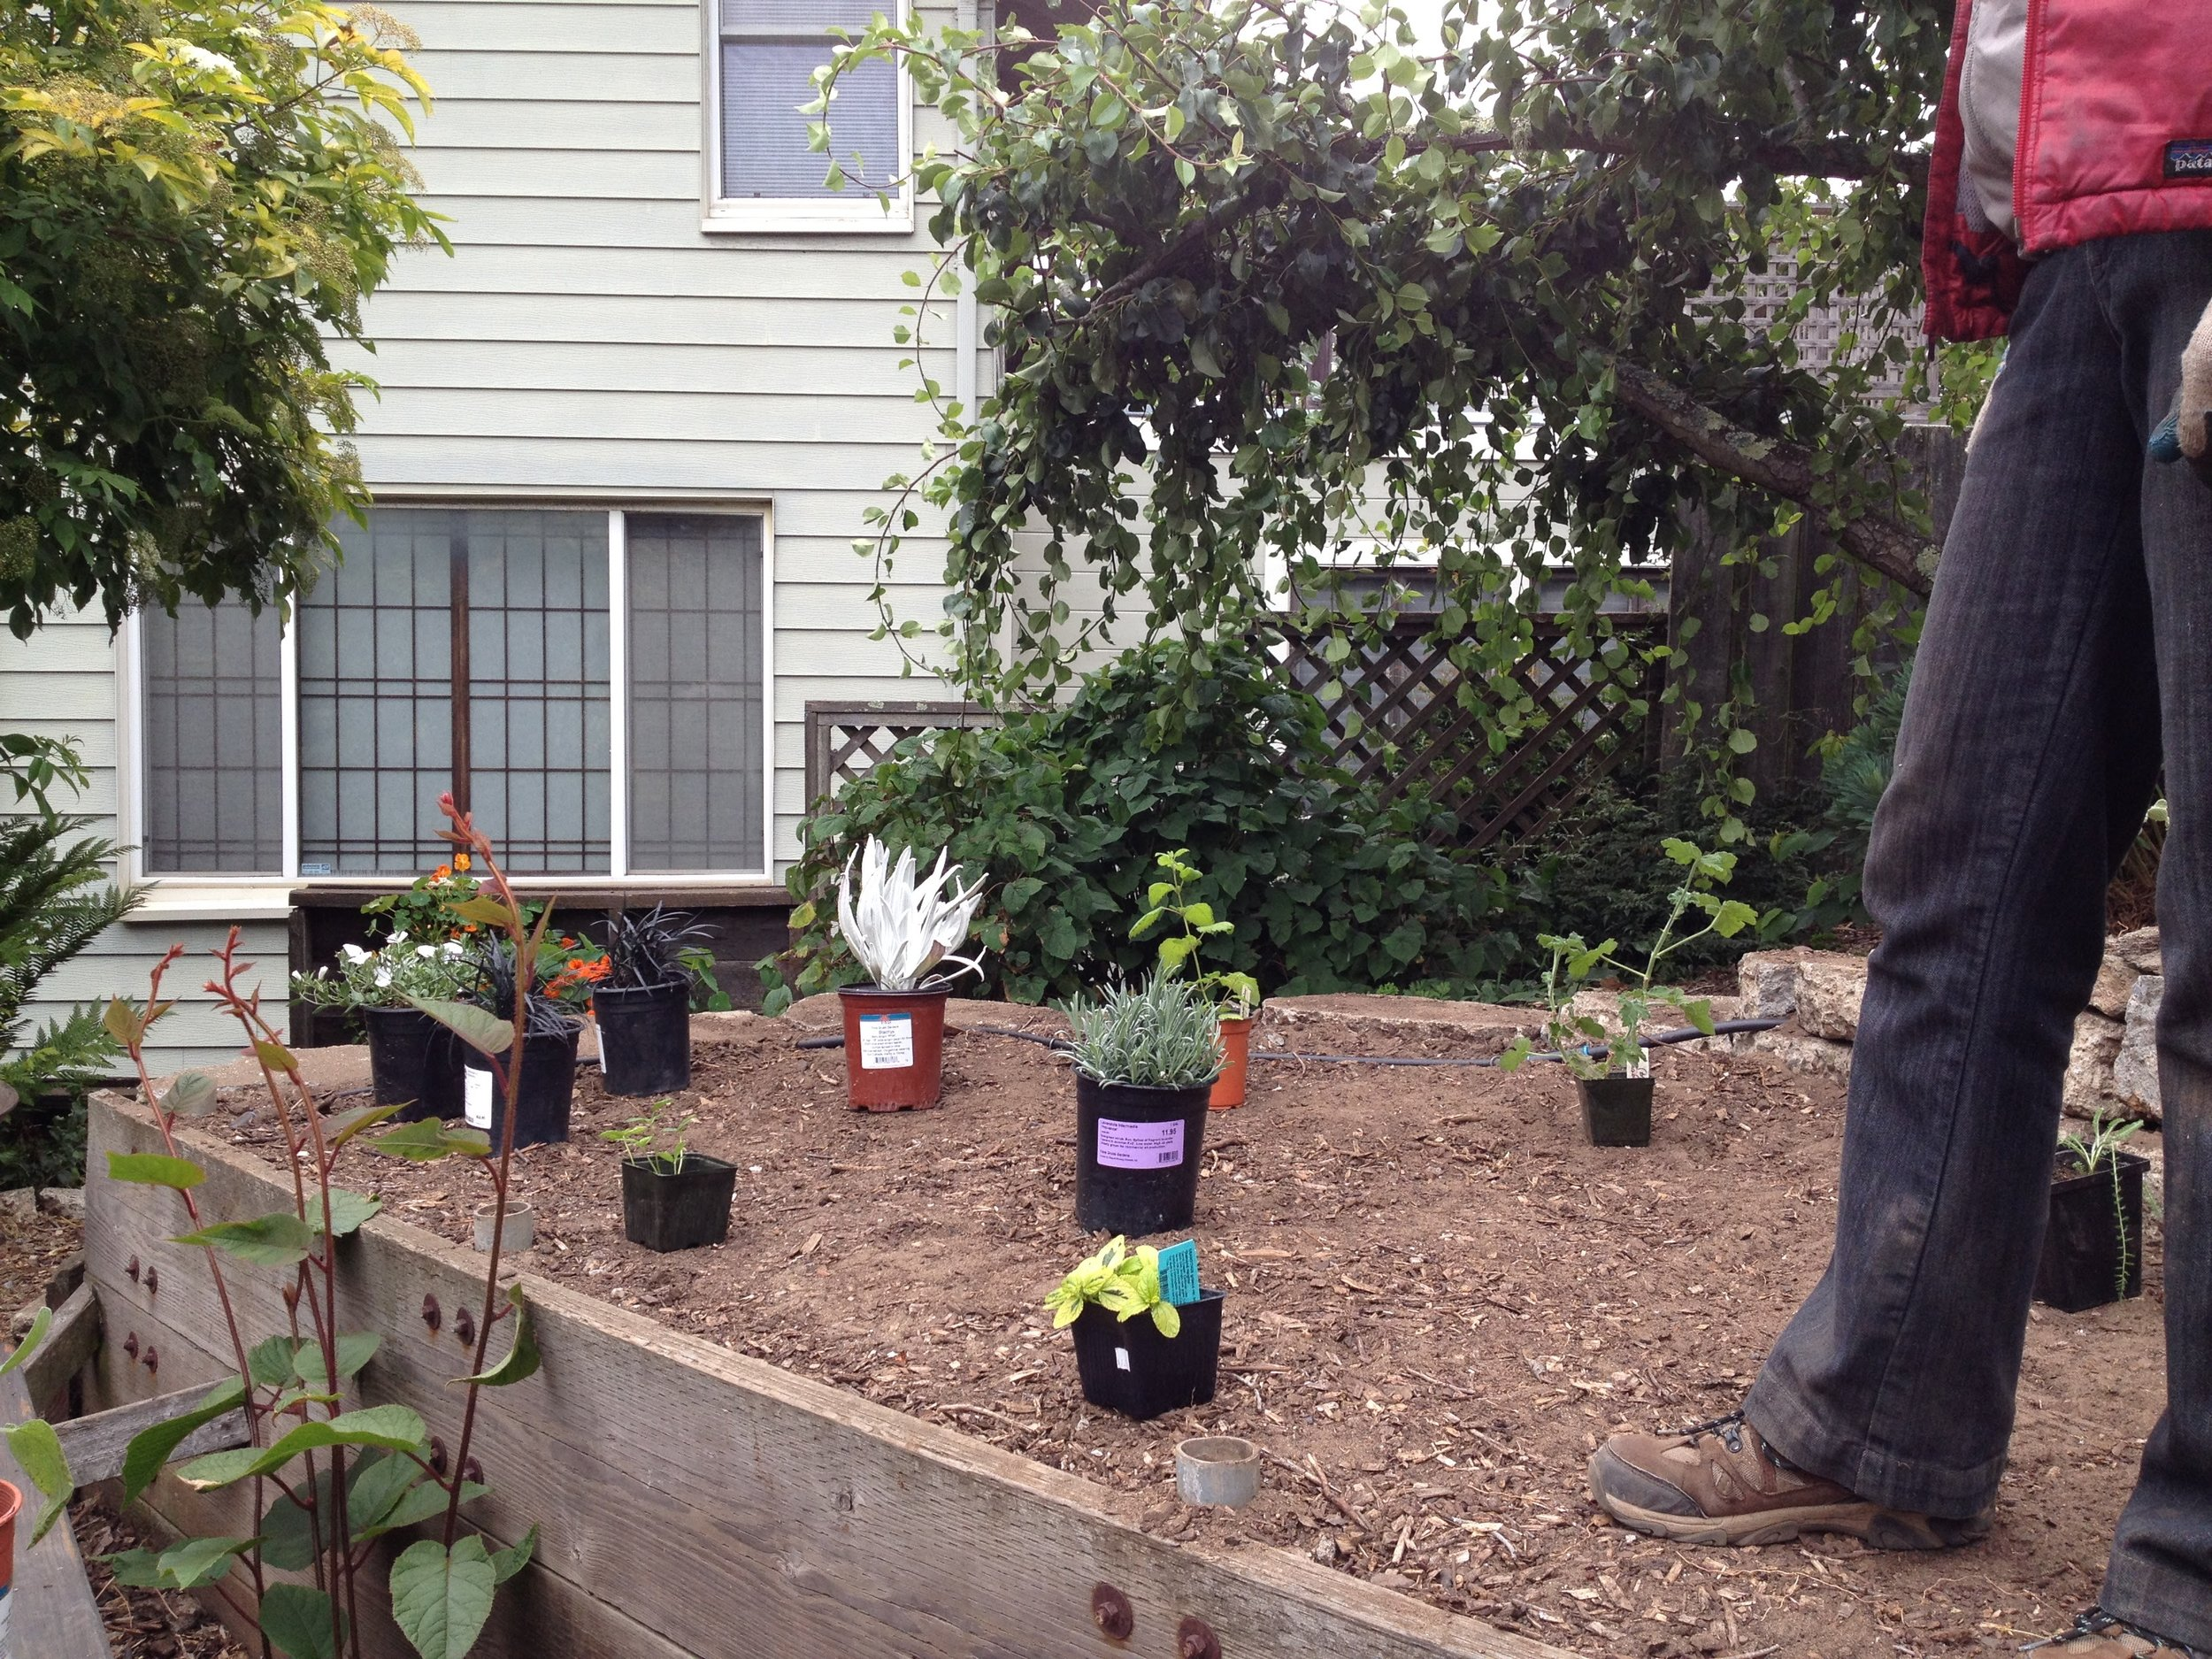 Take advantage of the break in the drought to establish a new drought-tolerant garden.